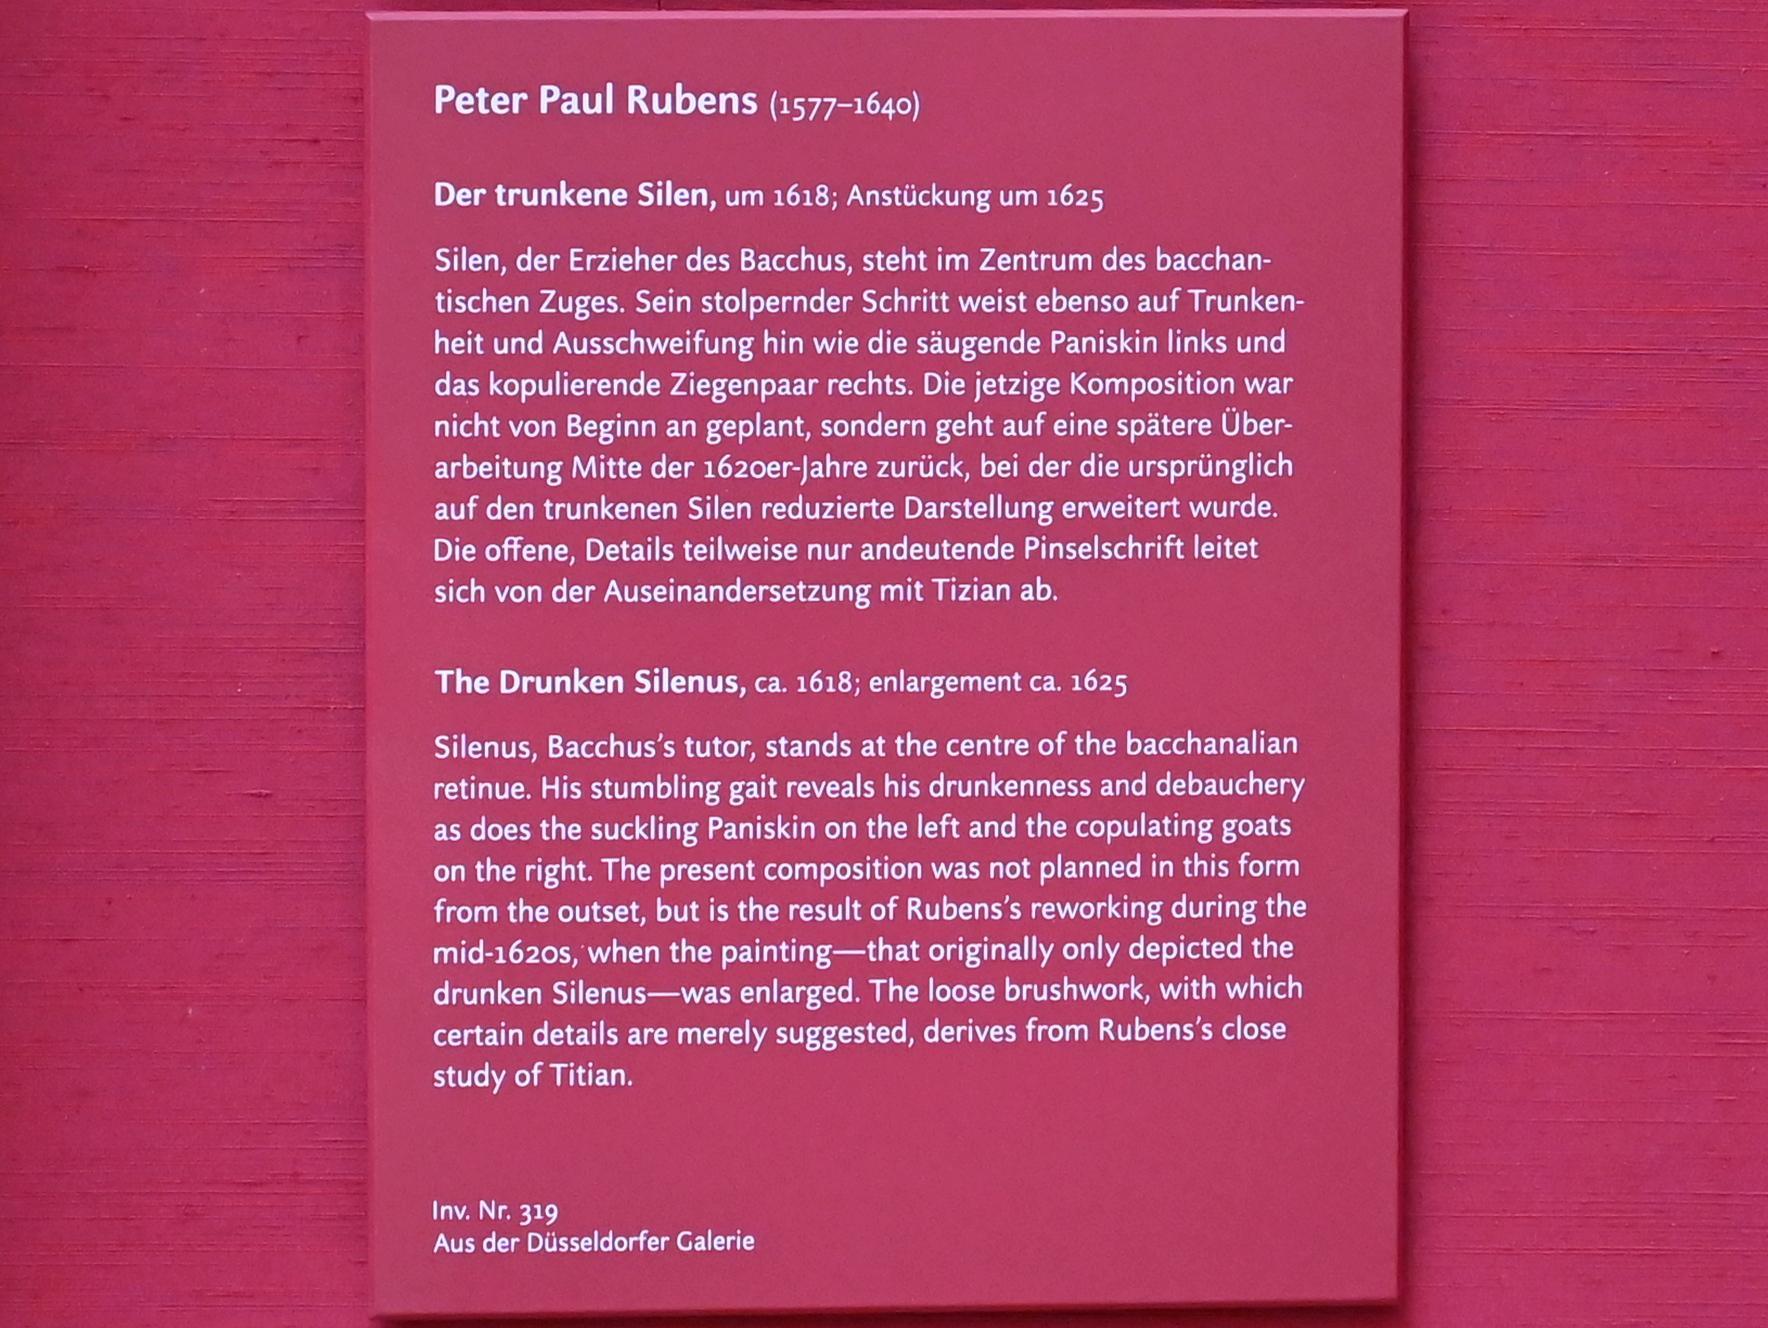 Peter Paul Rubens: Der trunkene Silen, um 1618, Bild 2/2